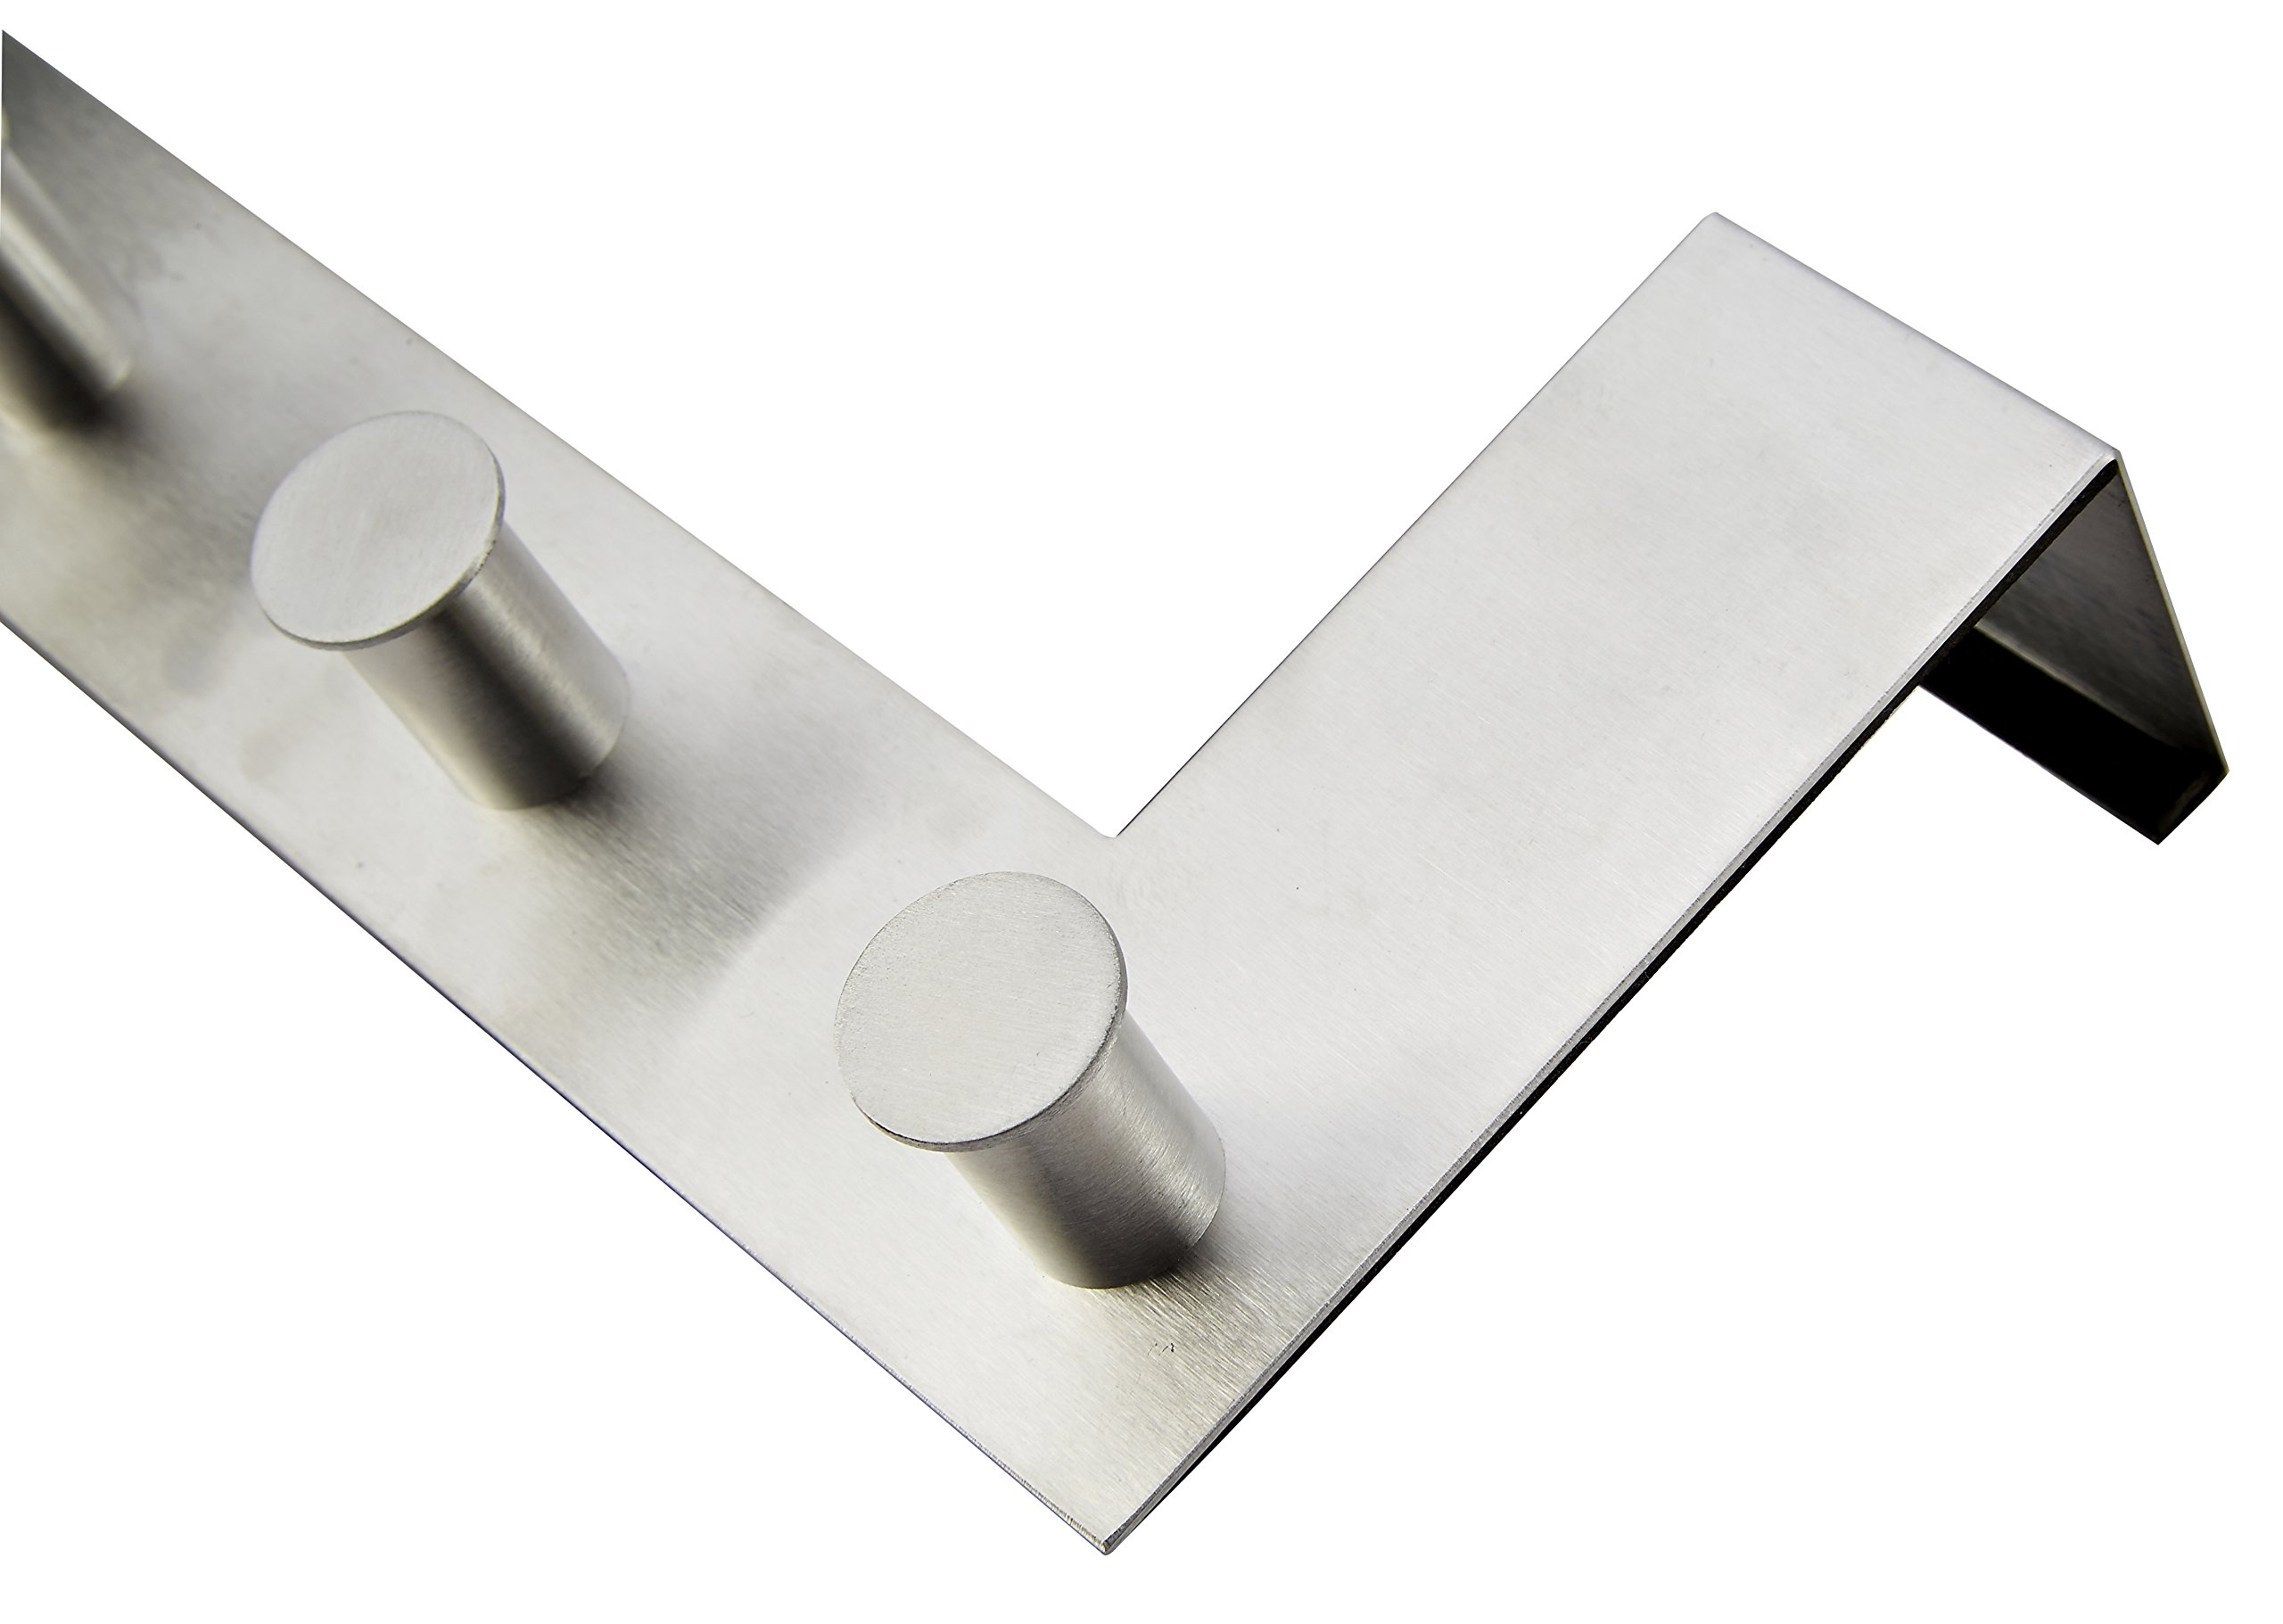 Pro Chef Kitchen Tools Over The Door Hooks - 6 Coat Hooks Pegs - No Drill Towel Rack For Bathroom Storage Closet - Behind The Door Organizer Clothes Rack - Office Cubicle Hat Shoe Handbag Purse Hanger